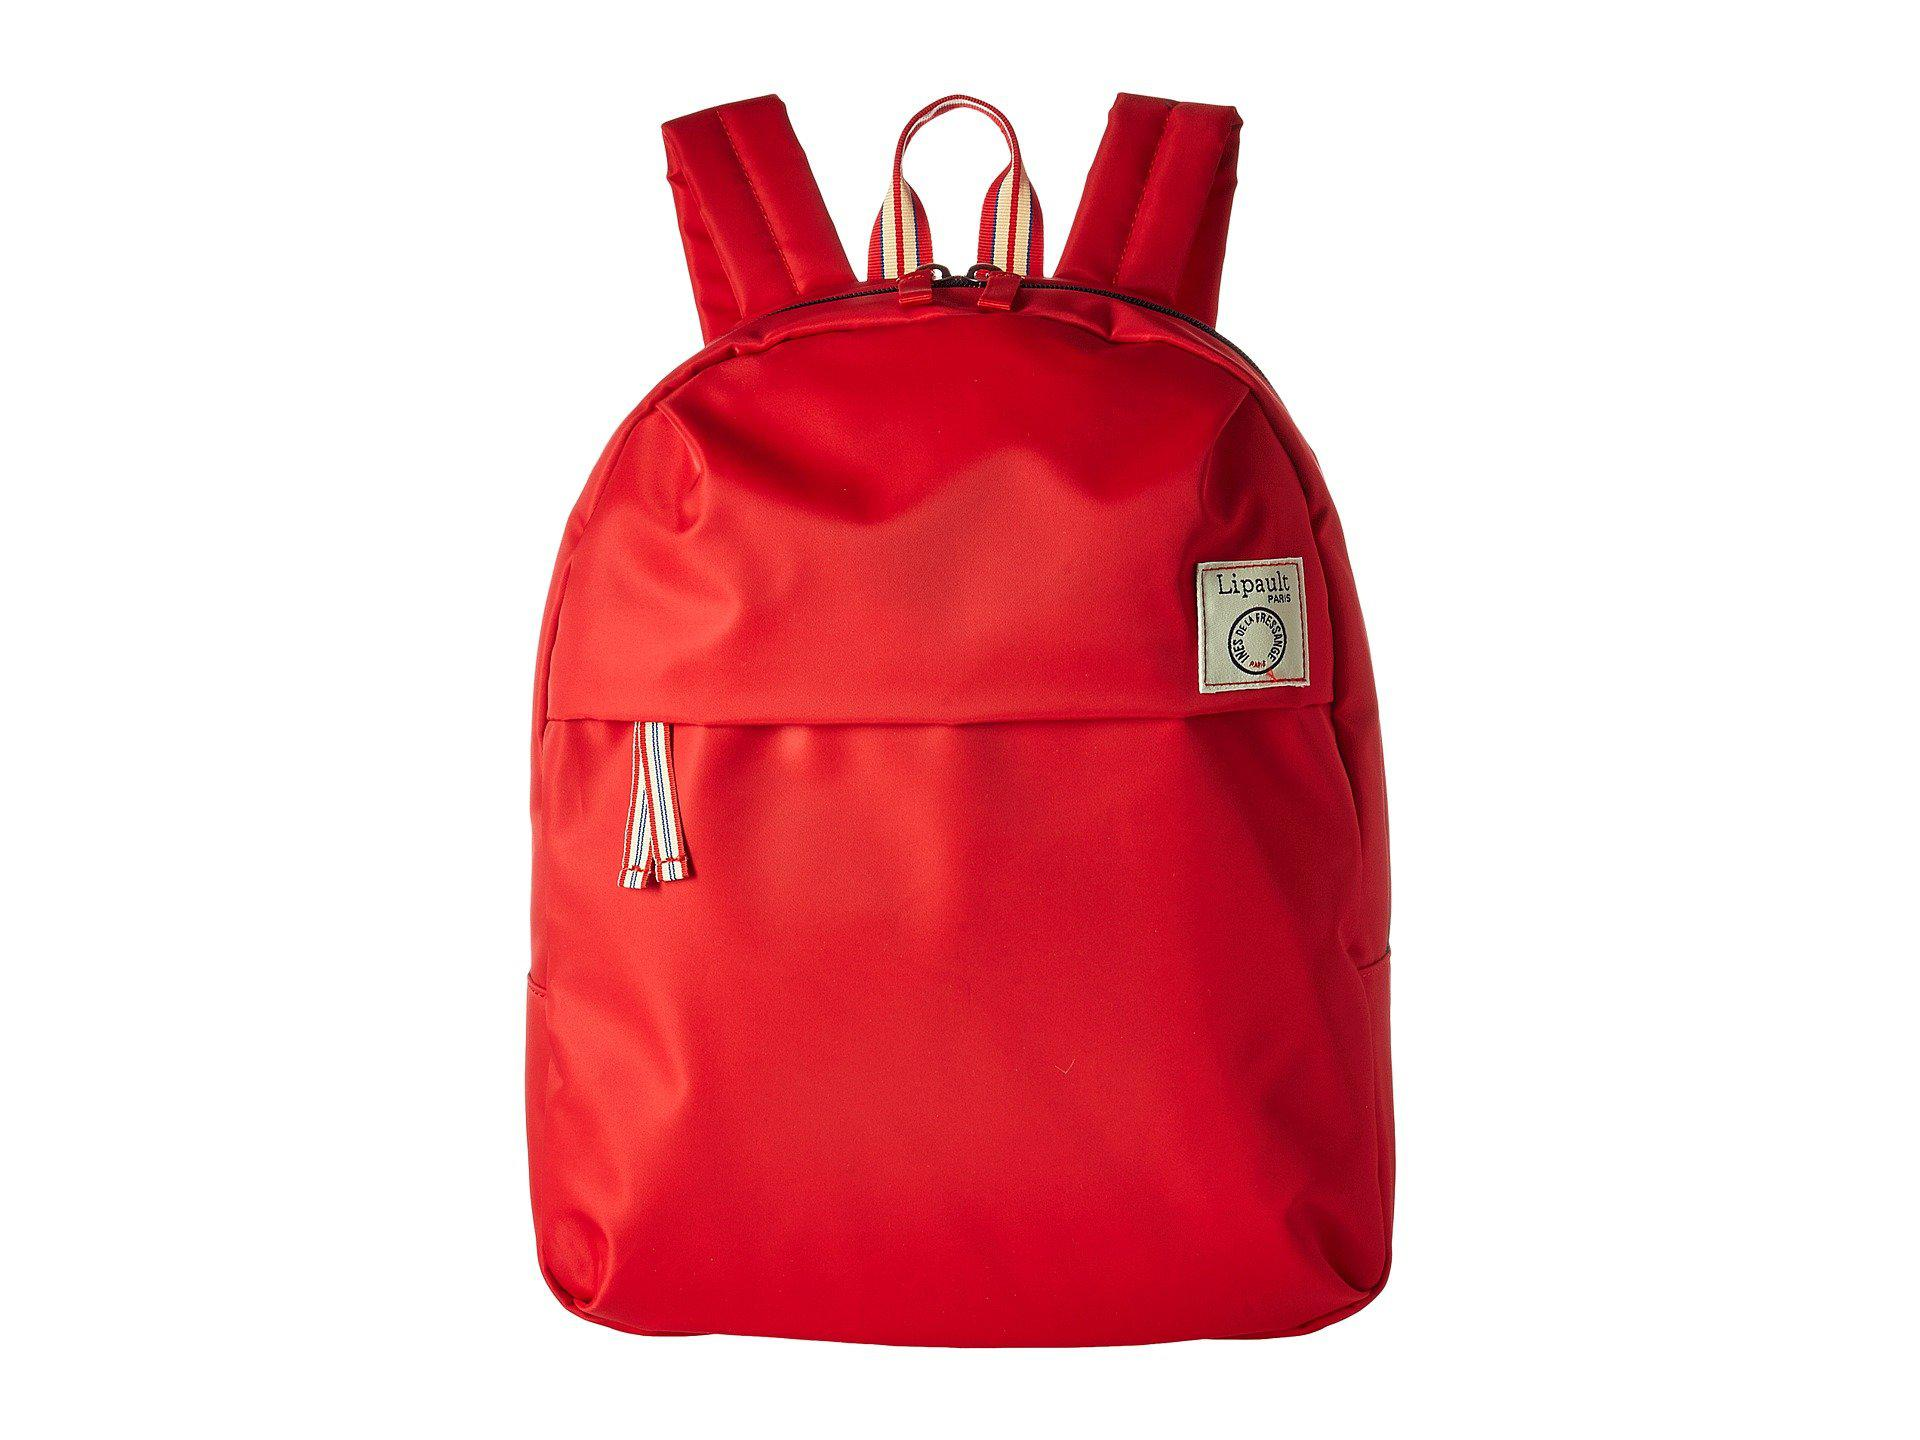 Lyst - Lipault Ines De La Fressange Medium Backpack (red) Backpack ... f63c1e2d5e950